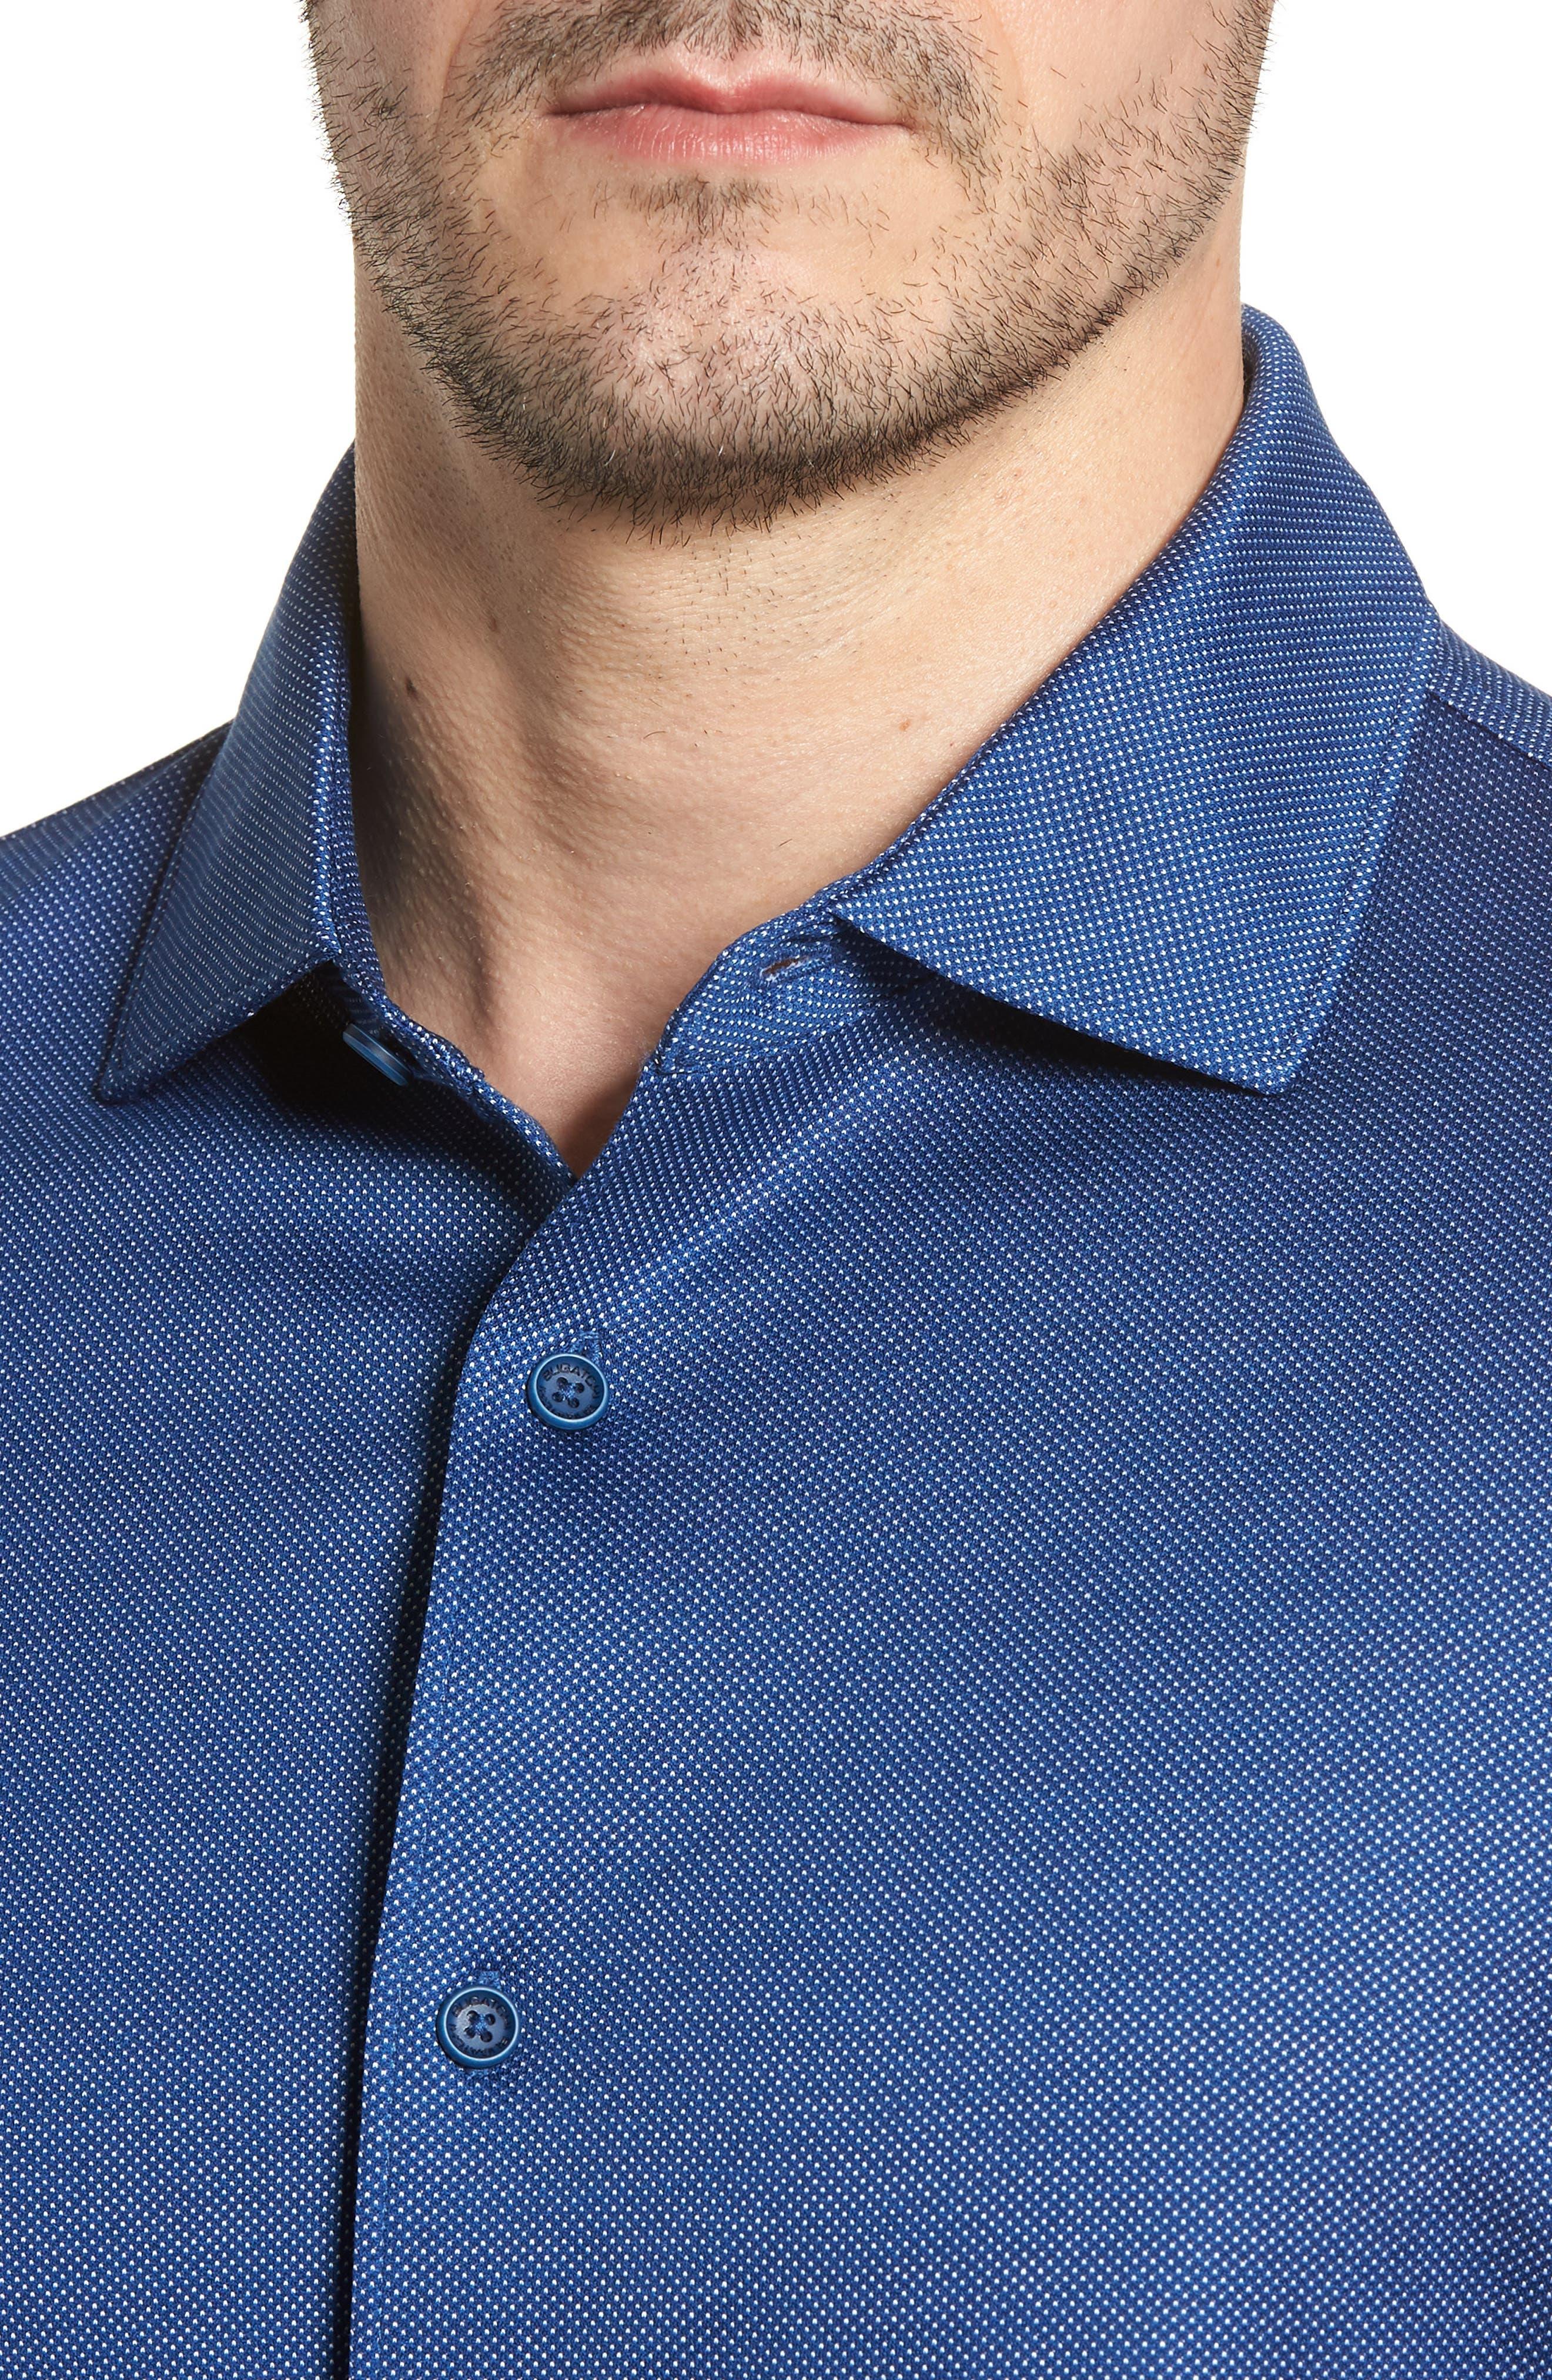 Regular Fit Microdot Print Knit Sport Shirt,                             Alternate thumbnail 4, color,                             411